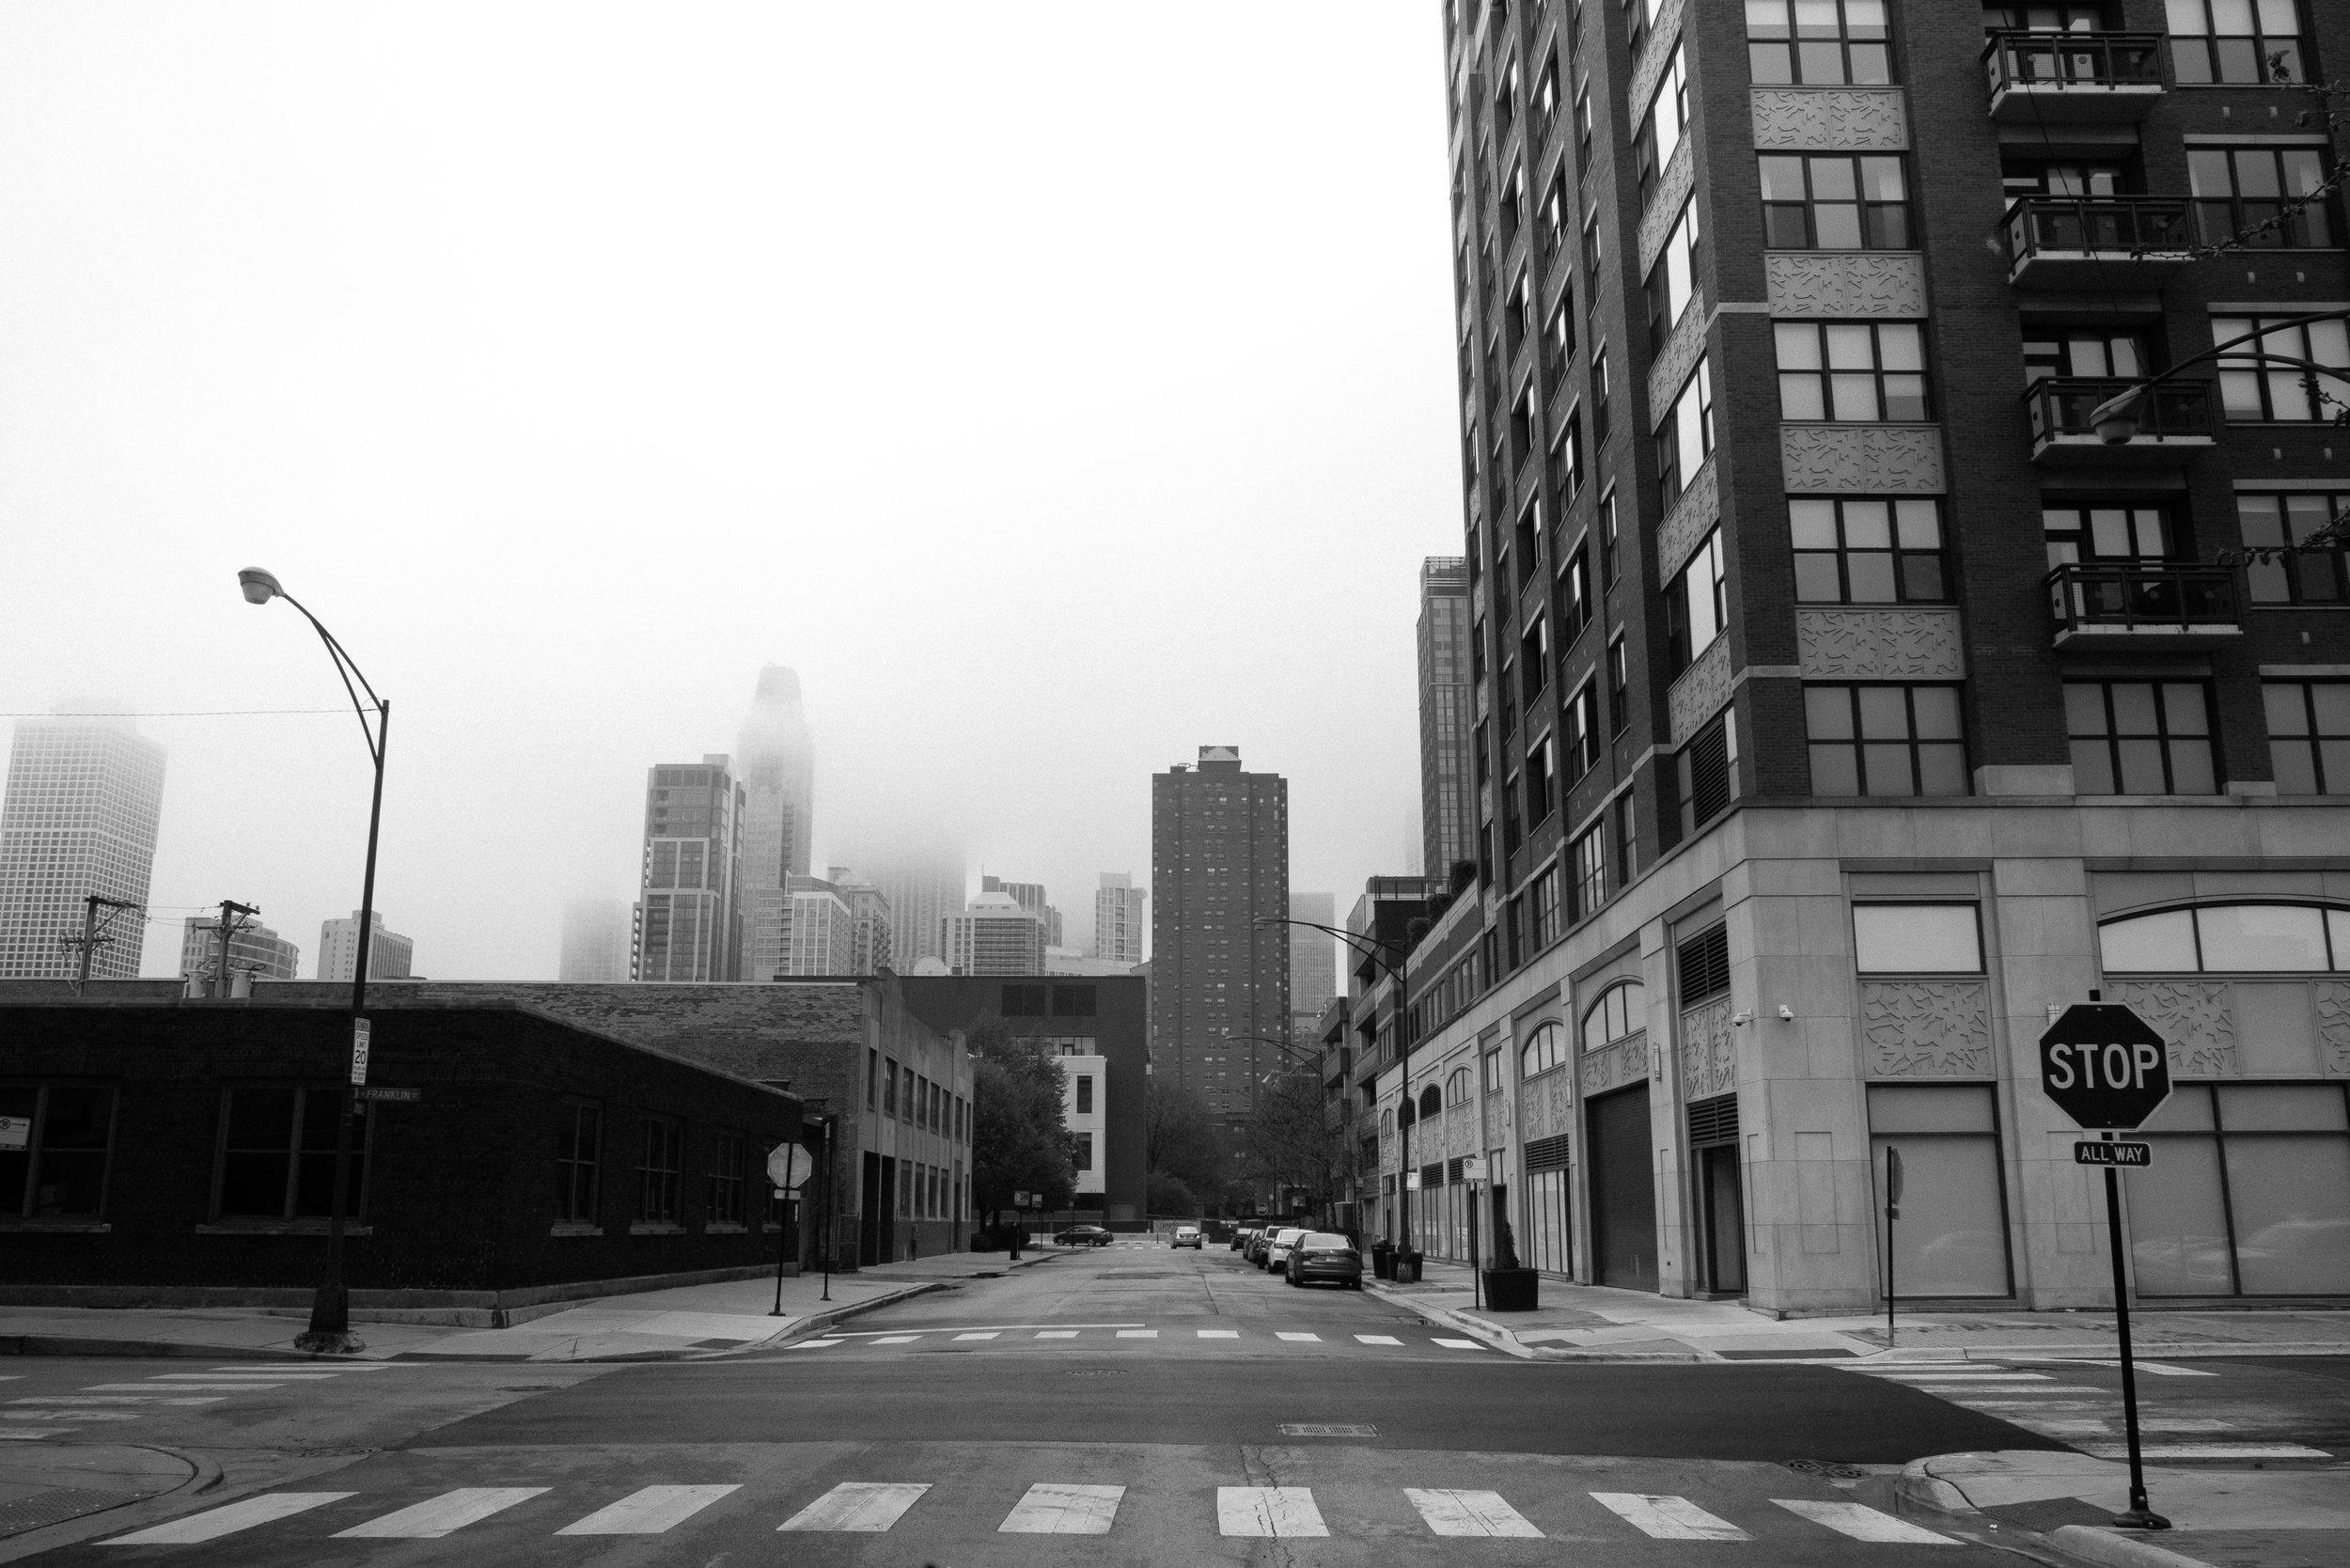 David-Olivier-Gascon-photography-chicago-studiod-montreal--07596.jpg